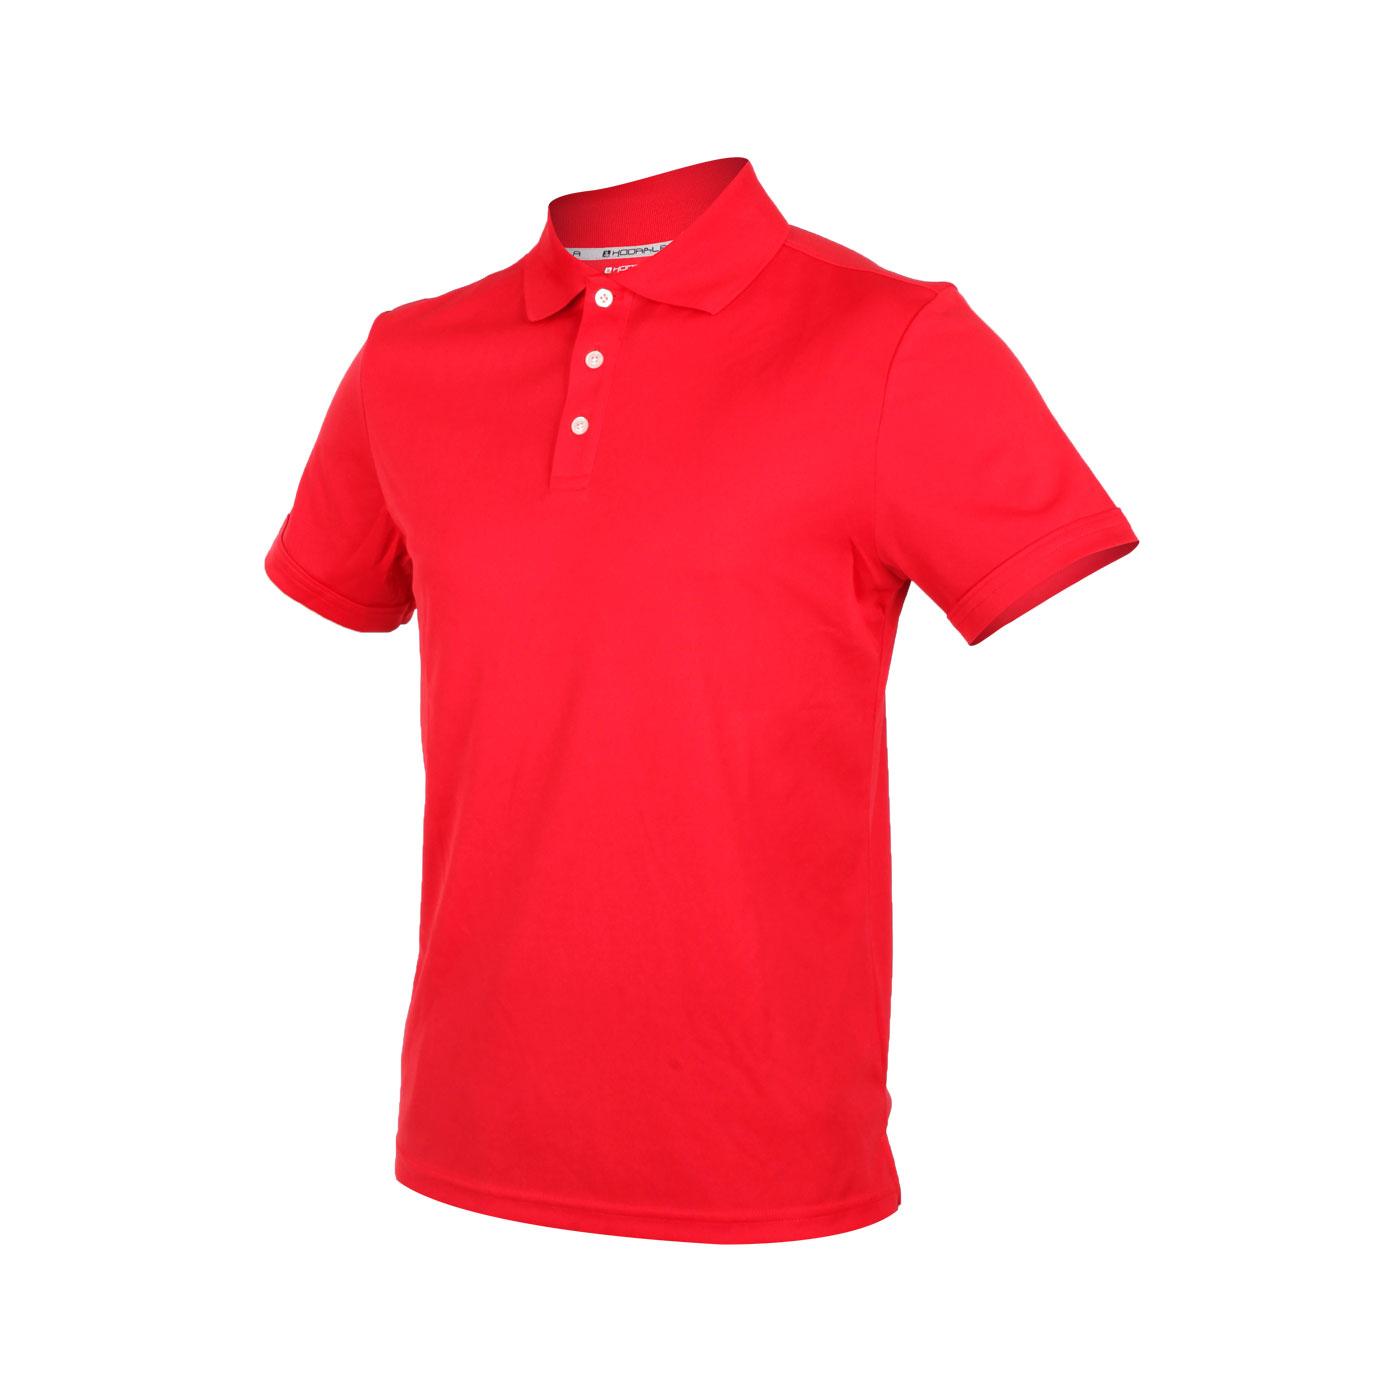 HODARLA 星際吸濕排汗短袖POLO衫 3151501 - 紅